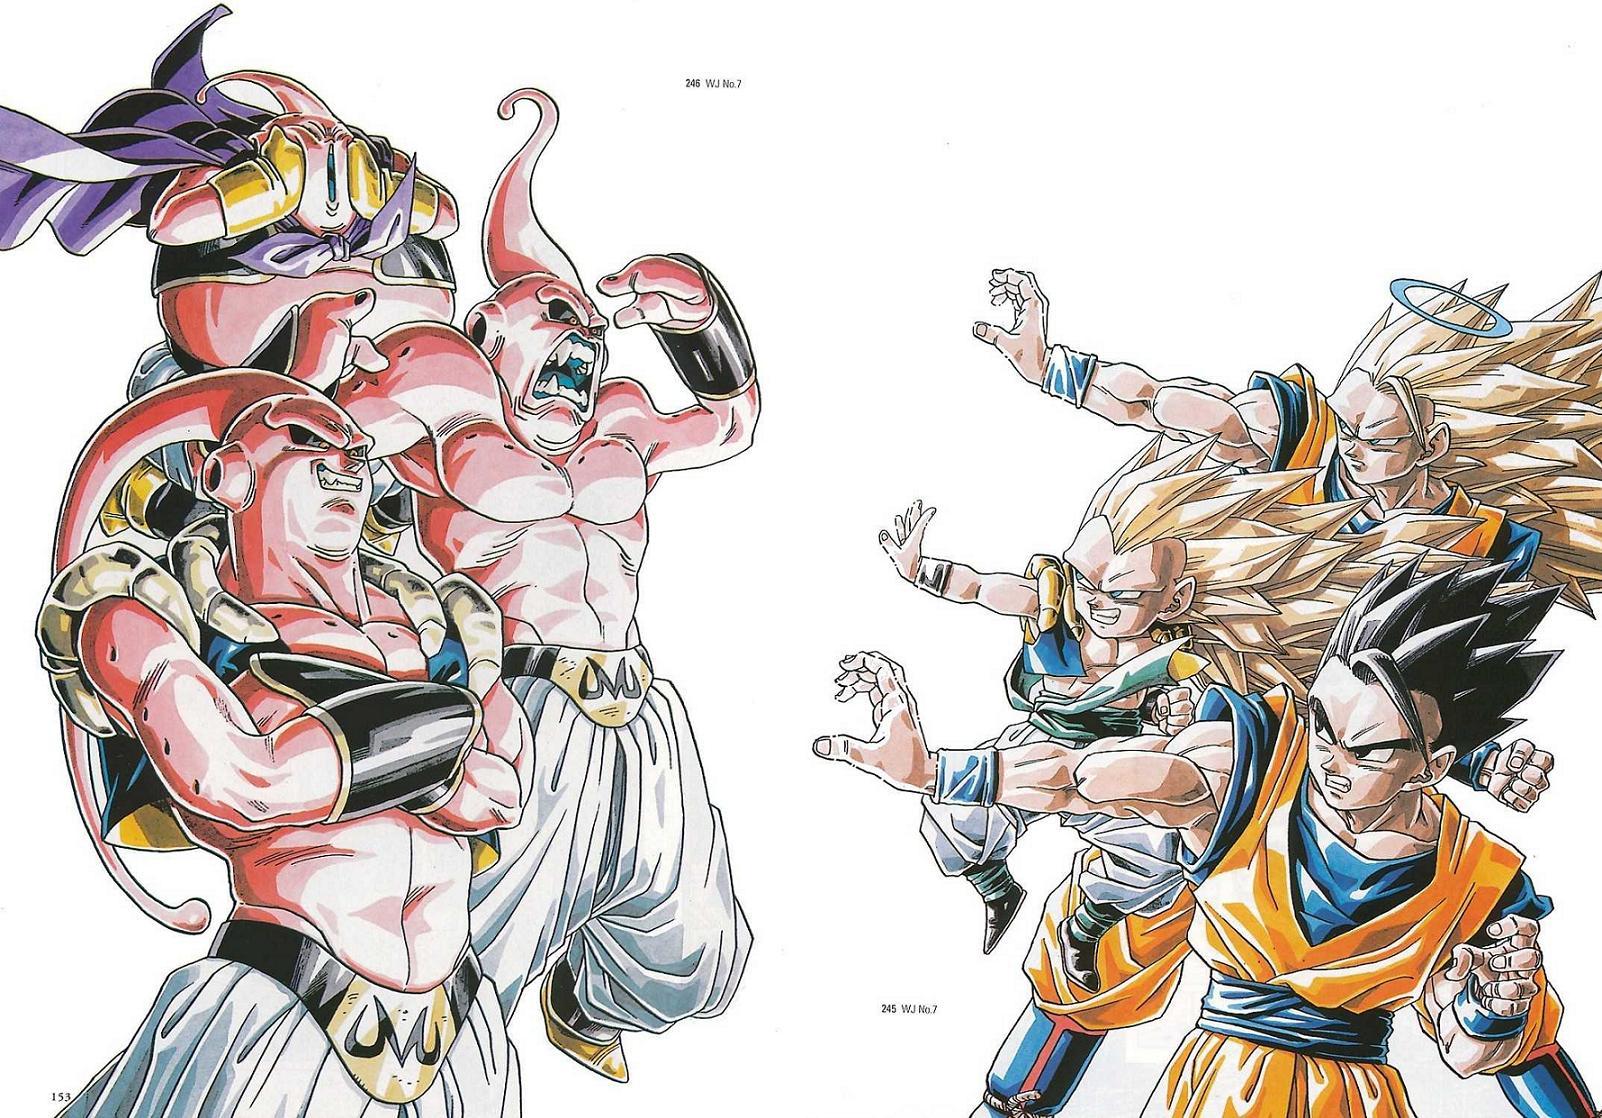 buu son goku son gohan dragon ball z wallpaper | 1602x1118 | 200706